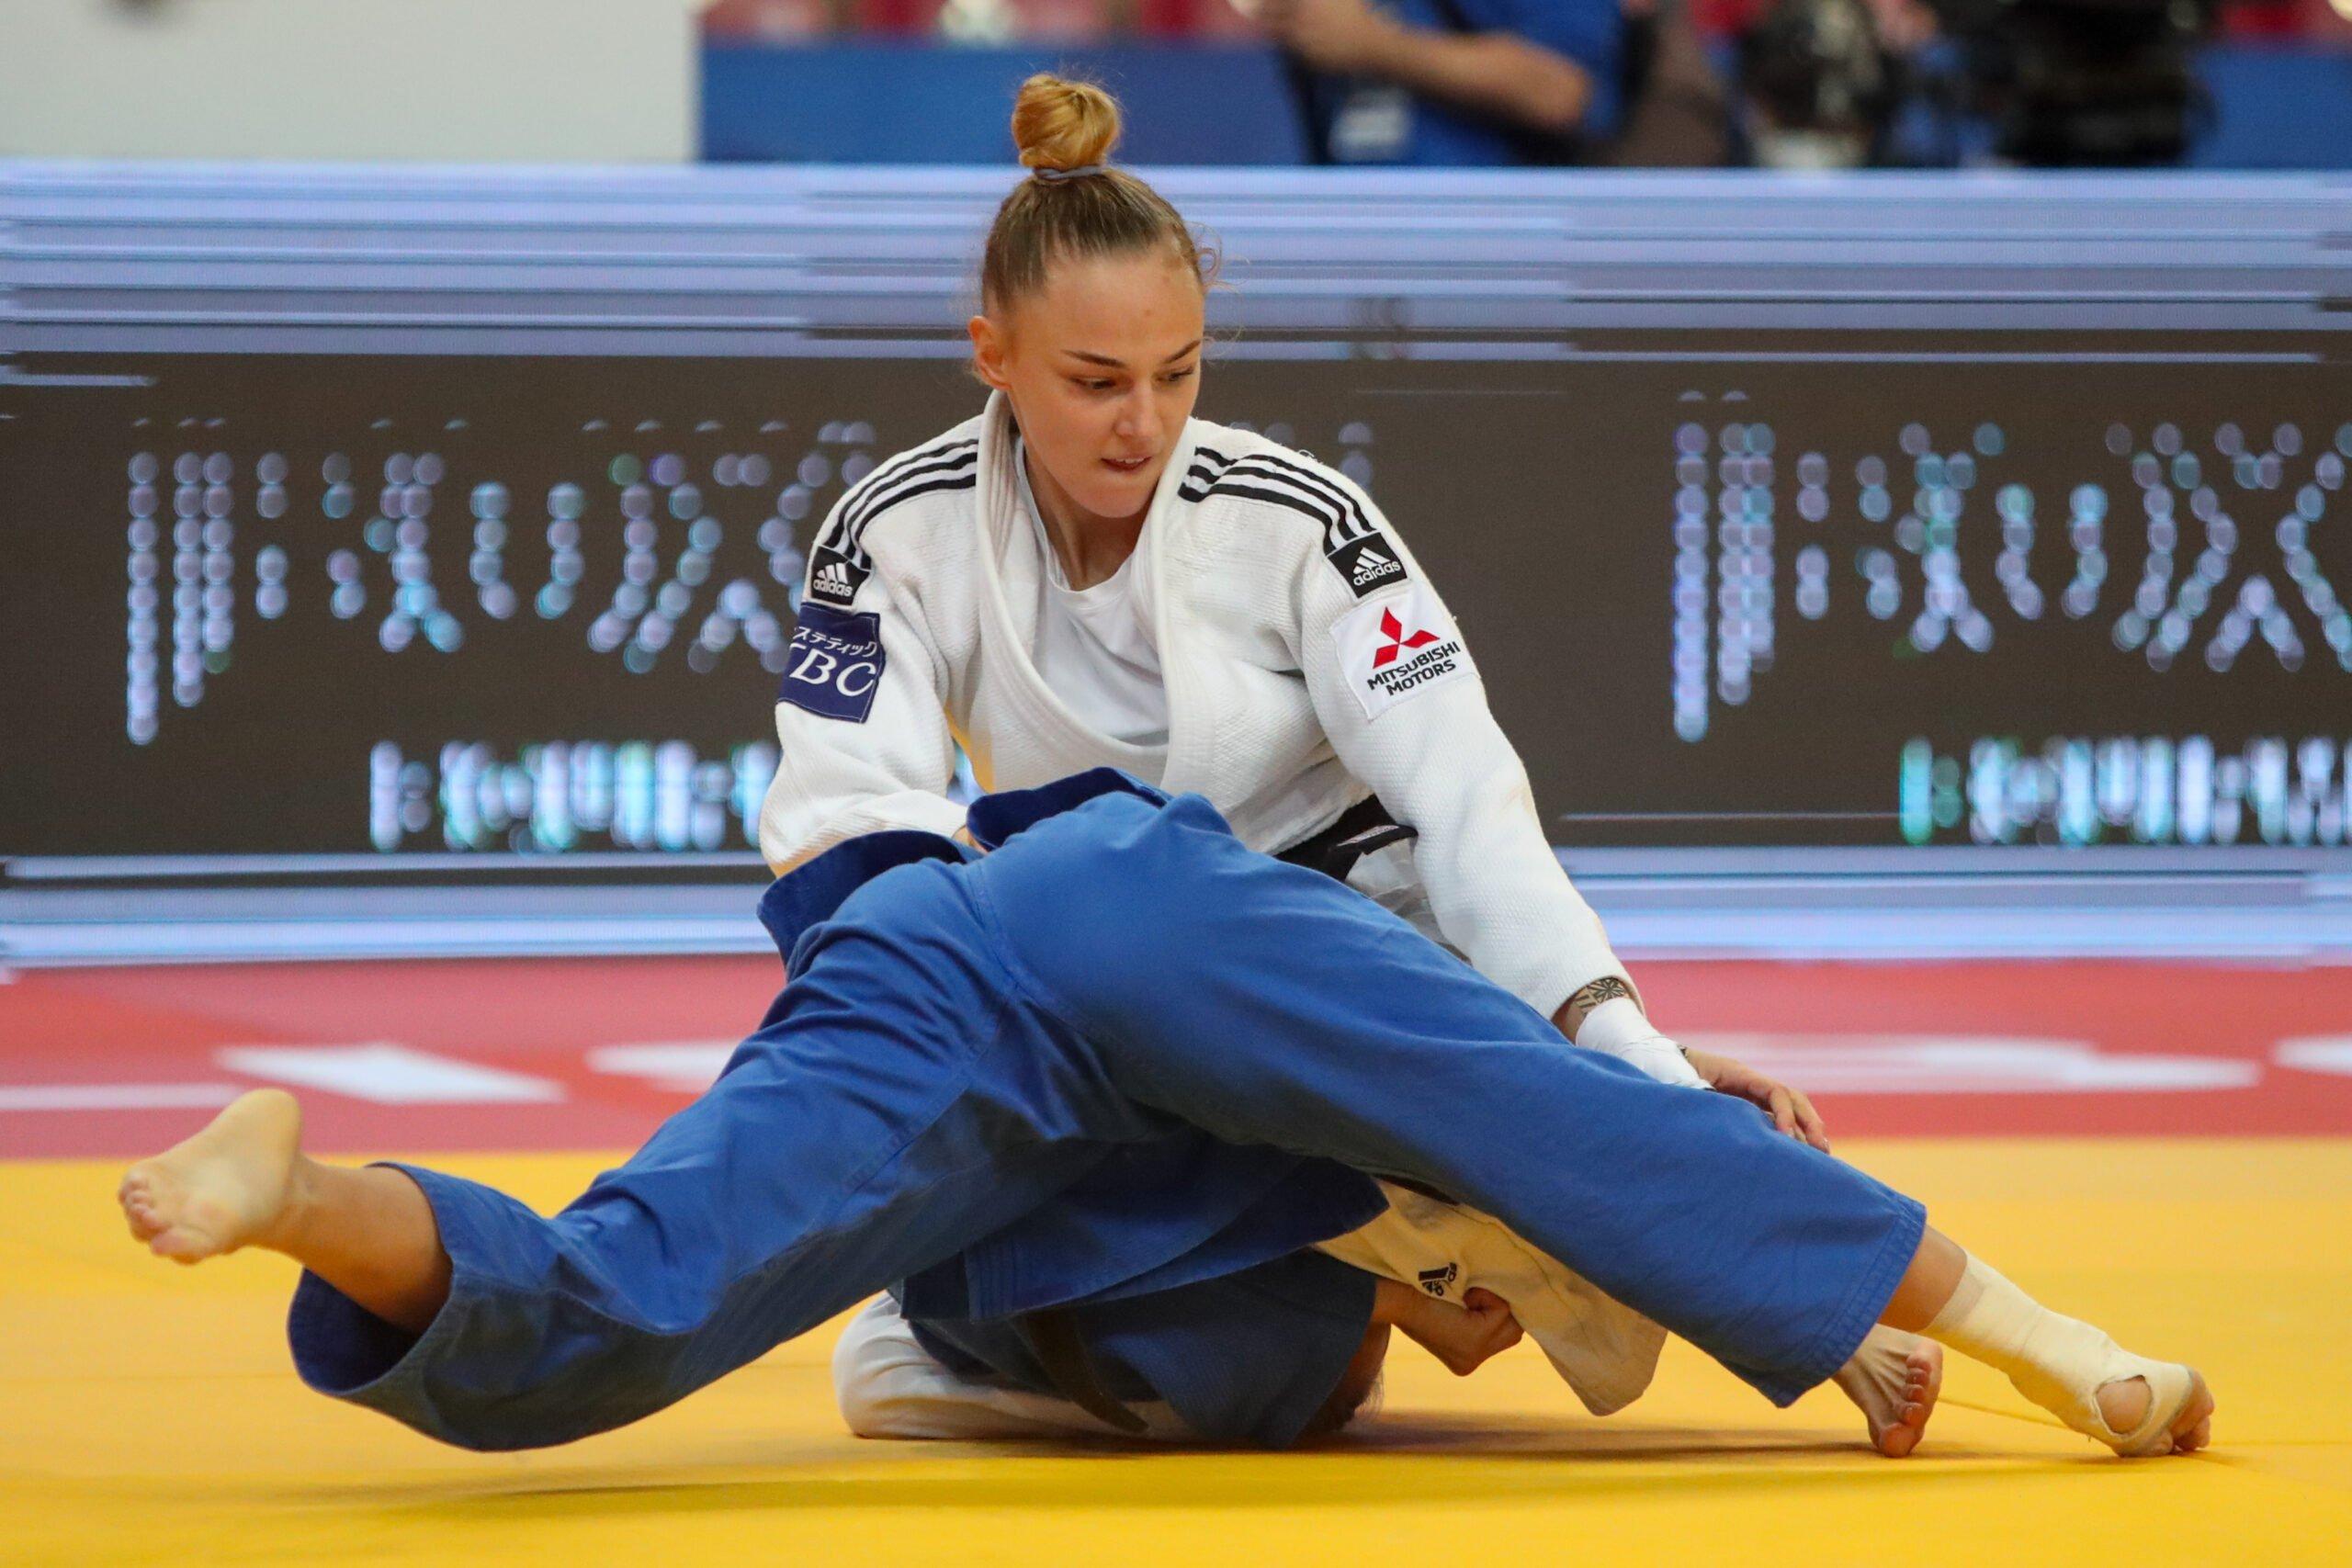 World Champion Daria Bilodid (UKR) is wearing adidas